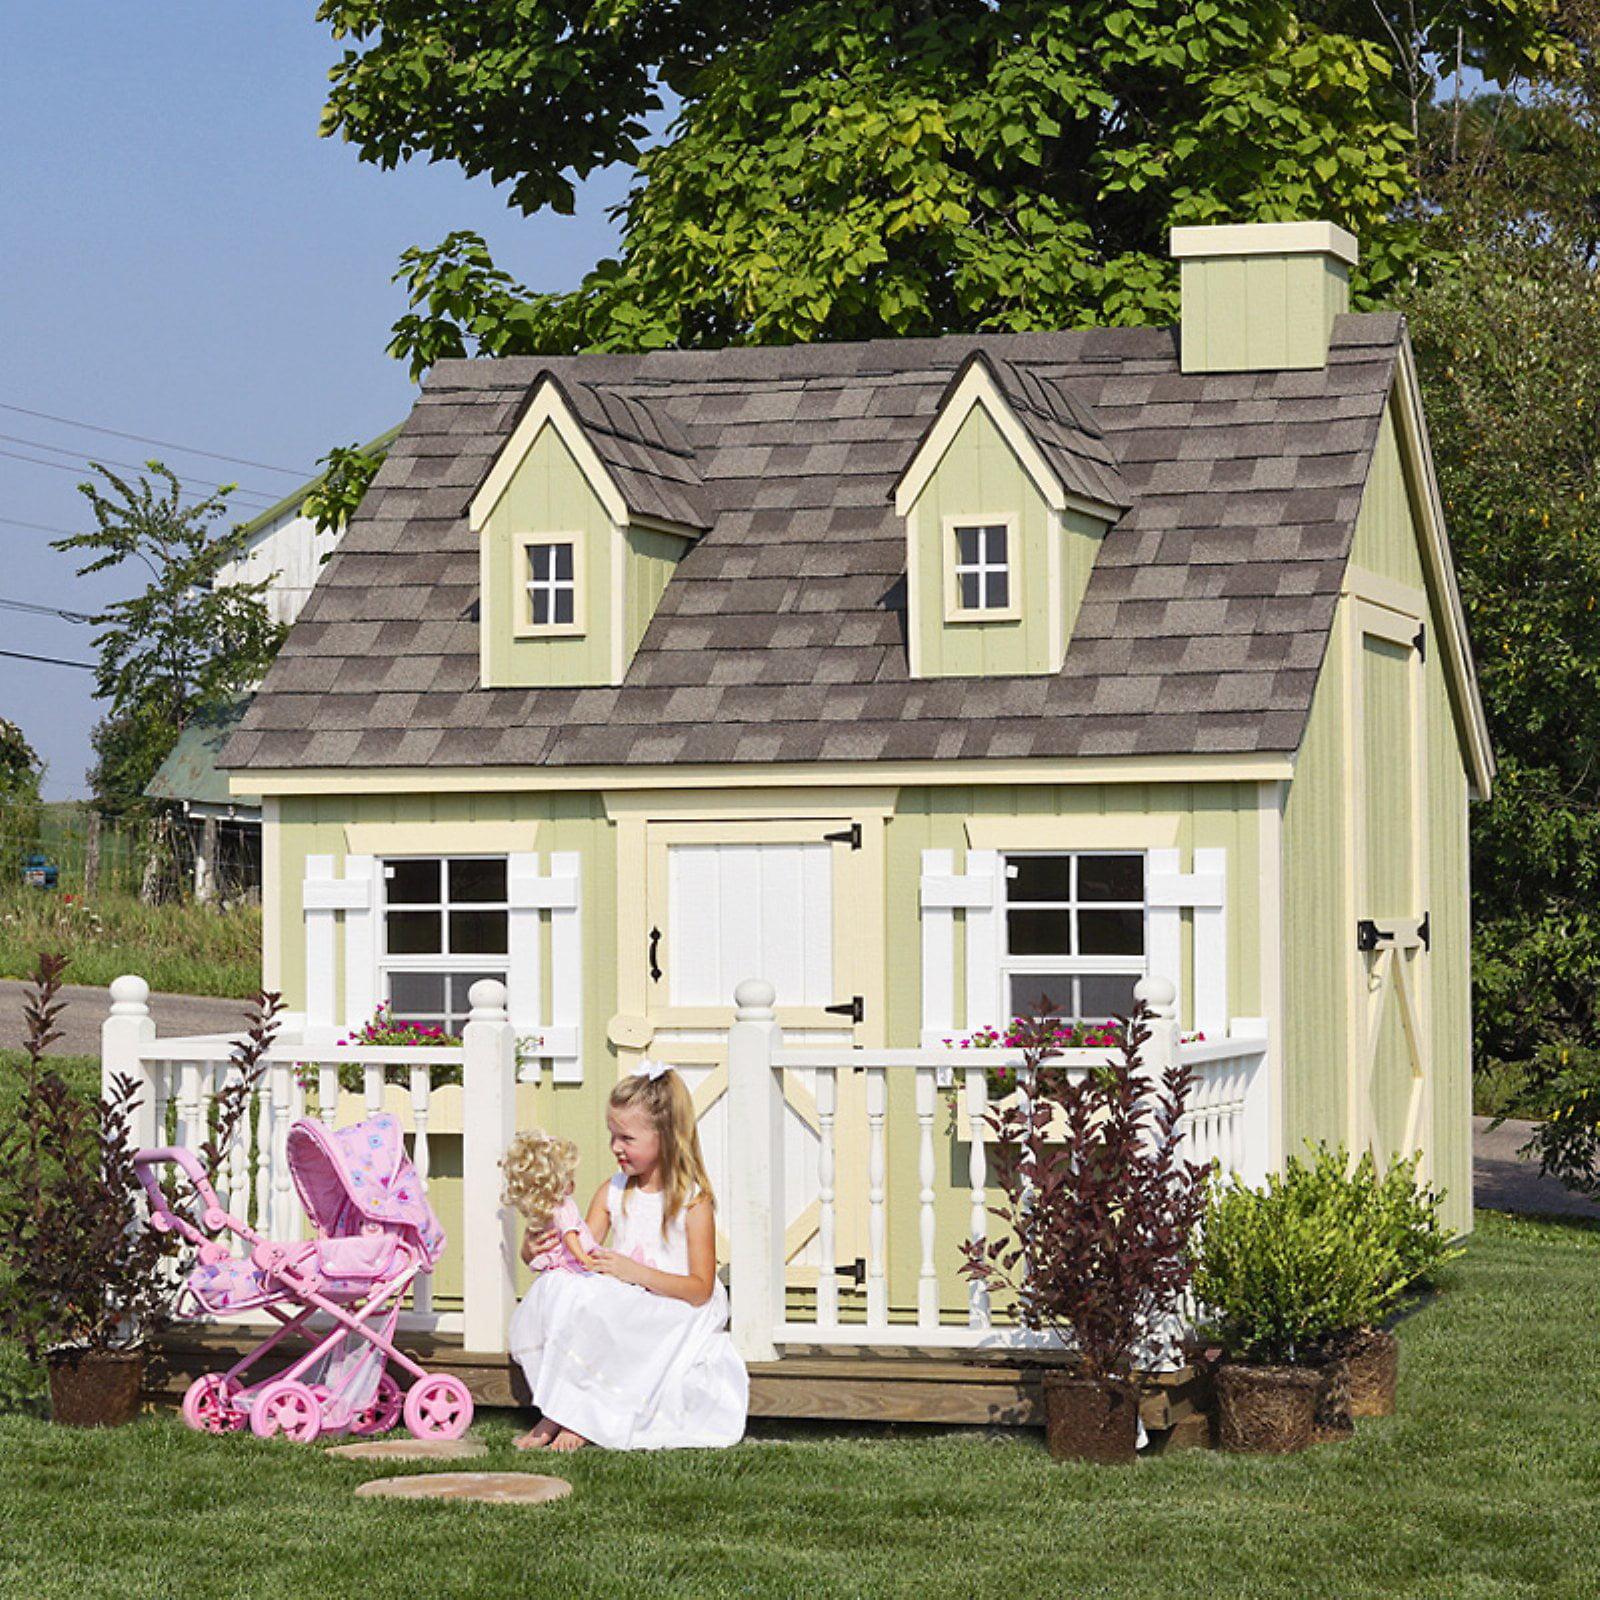 Little Cottage Cape Cod 8 x 8 ft. Wood Playhouse by Little Cottage Co